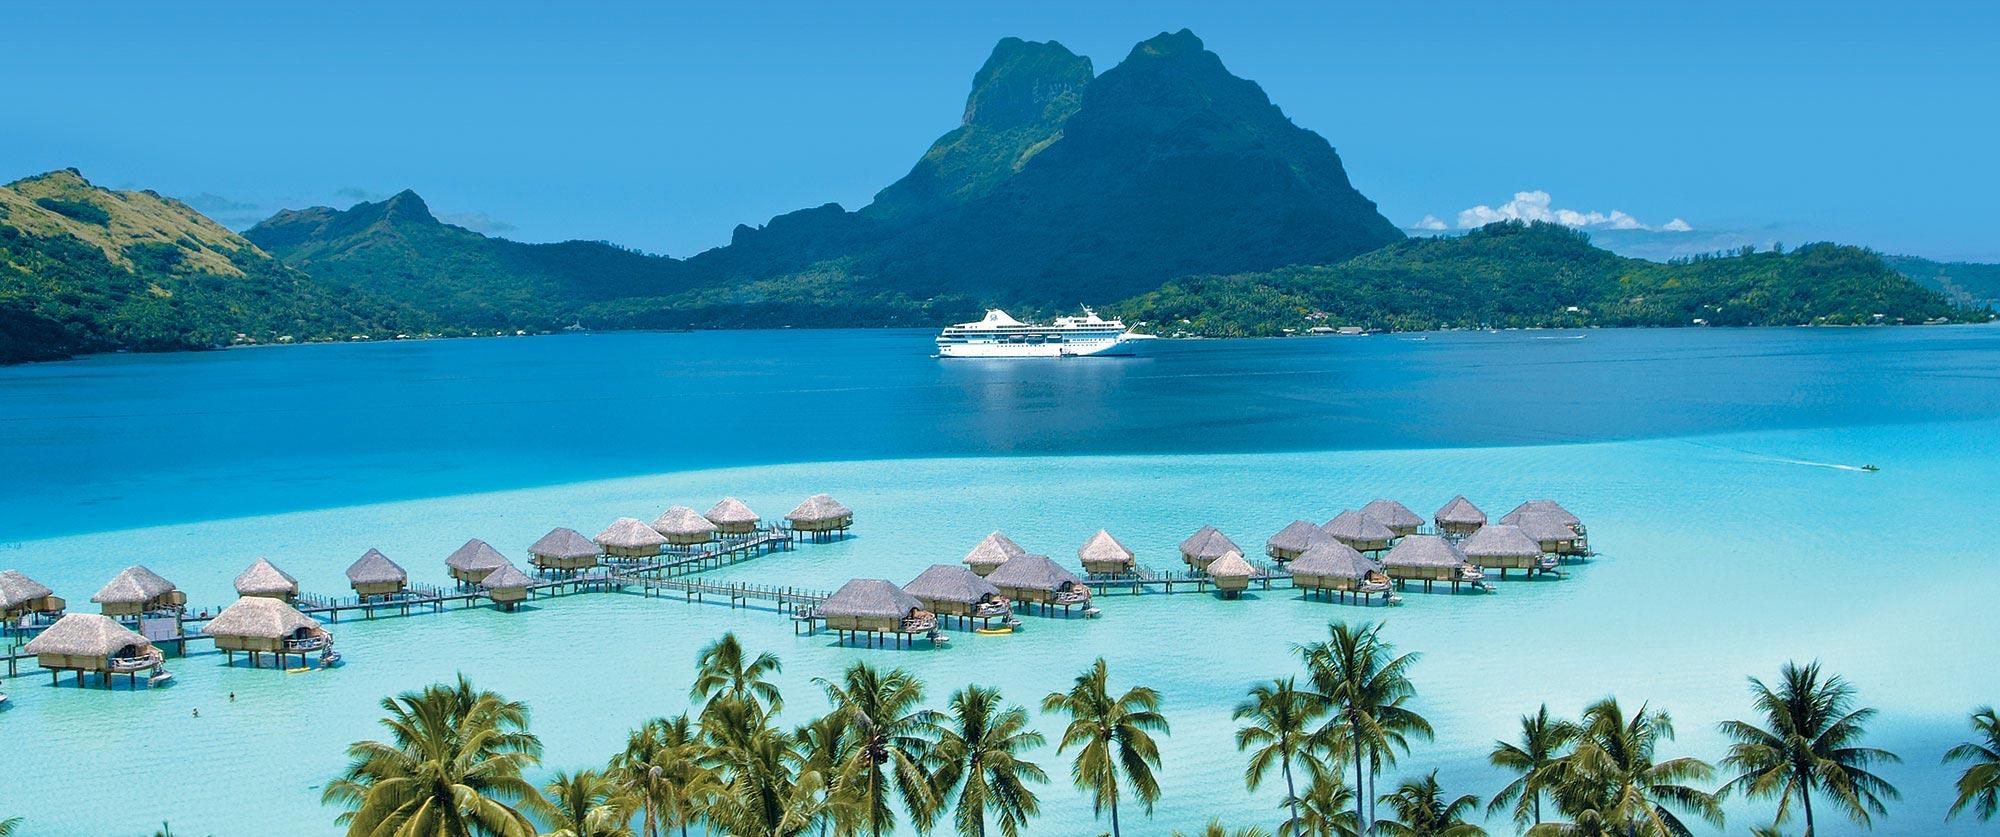 Tahiti Tourisme Arts Et Voyages